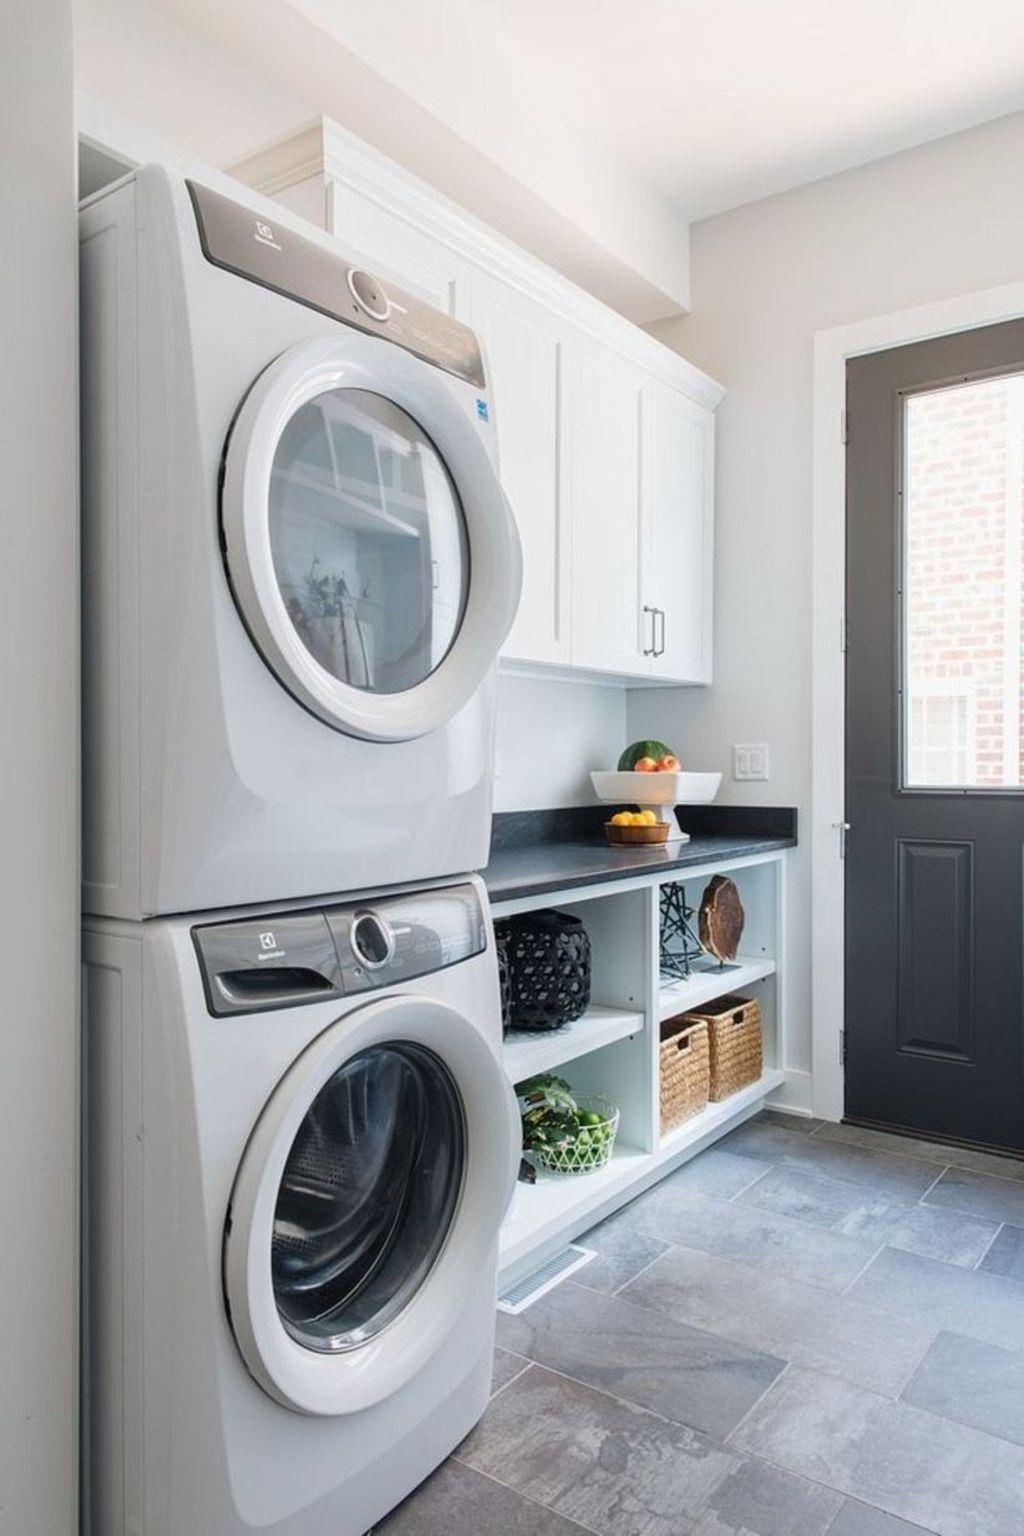 Inspiring Small Laundry Room Design And Decor Ideas 19 Hmdcrtn